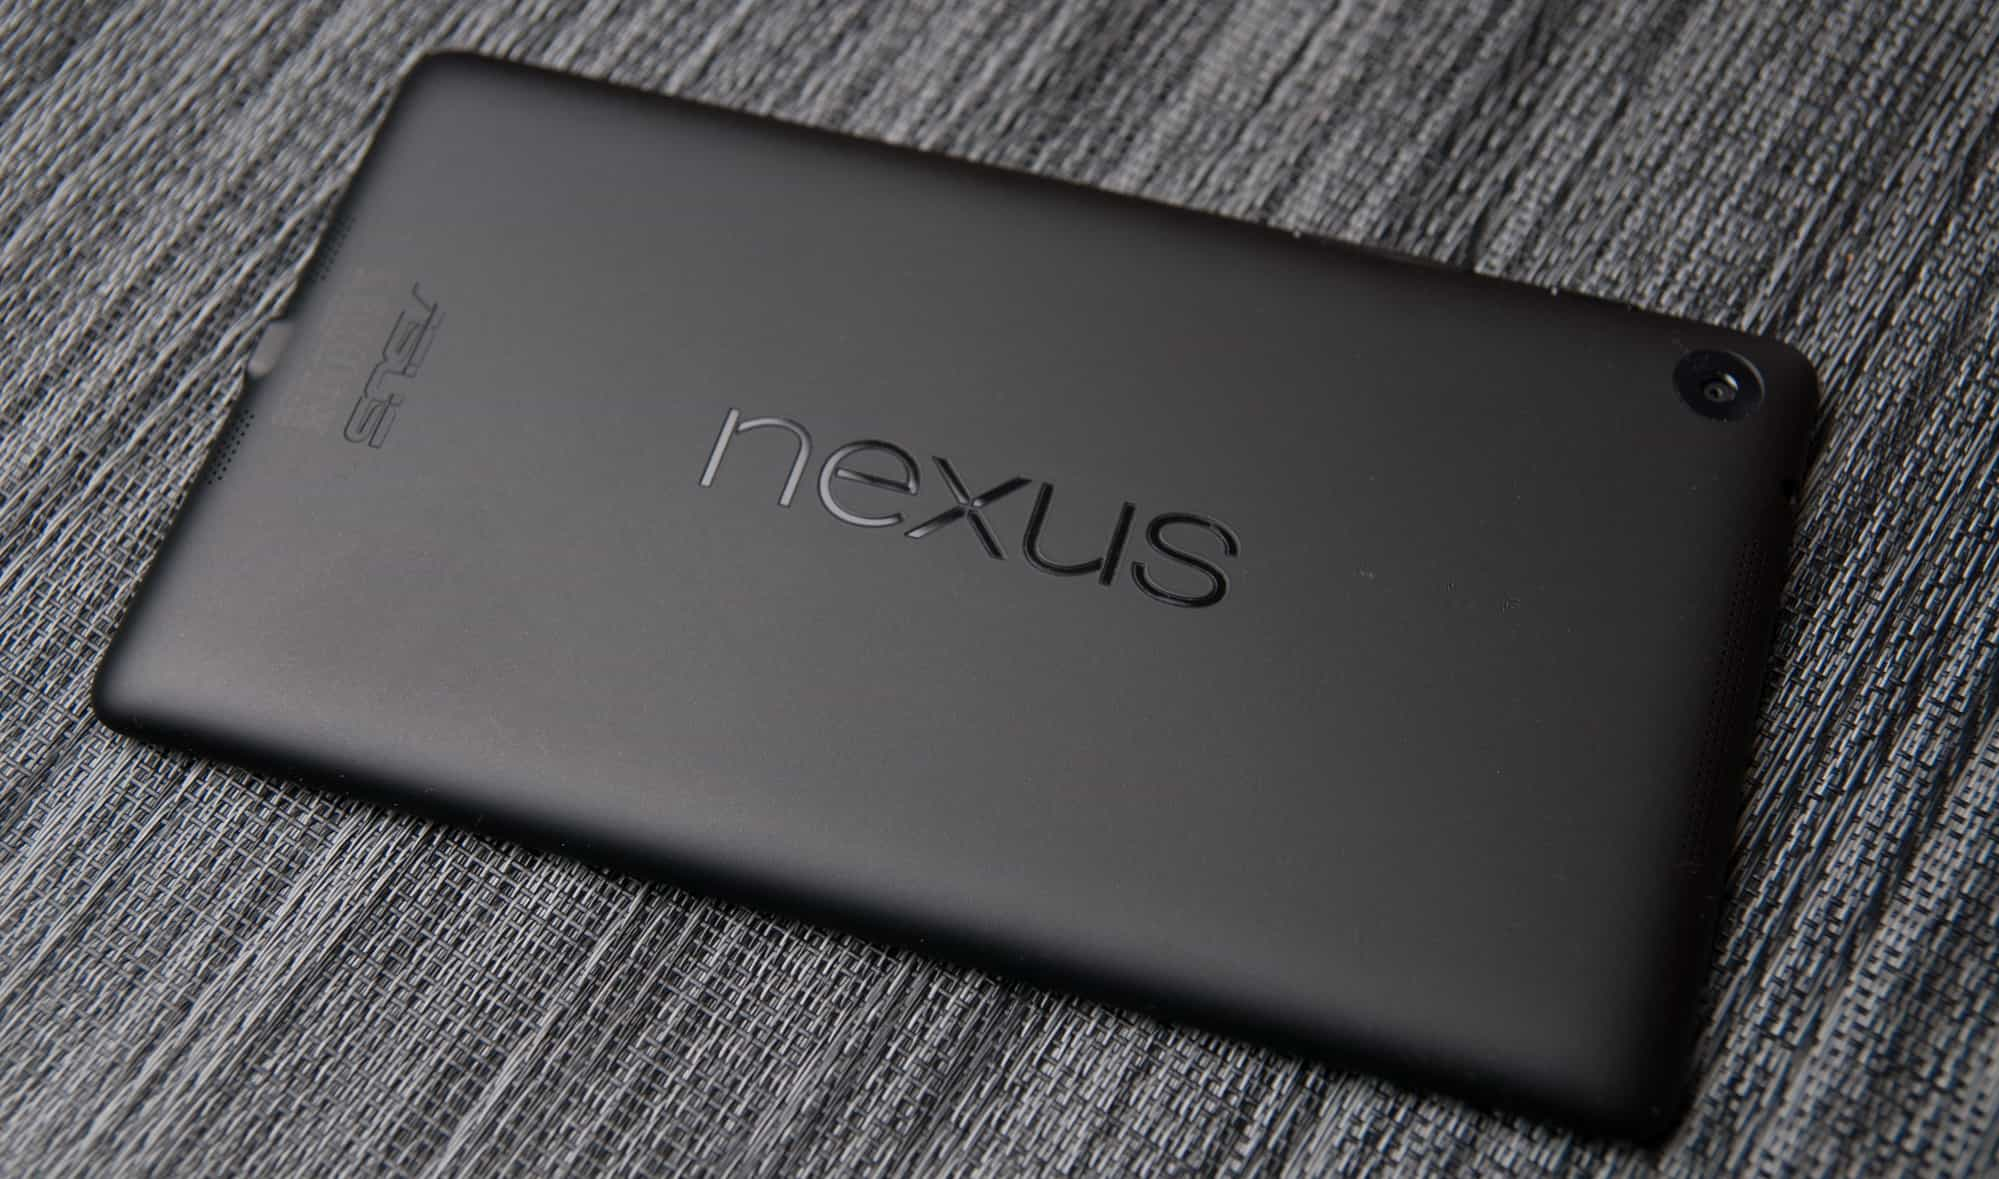 Asus Google Nexus 7 2013 Androidheadlines Com